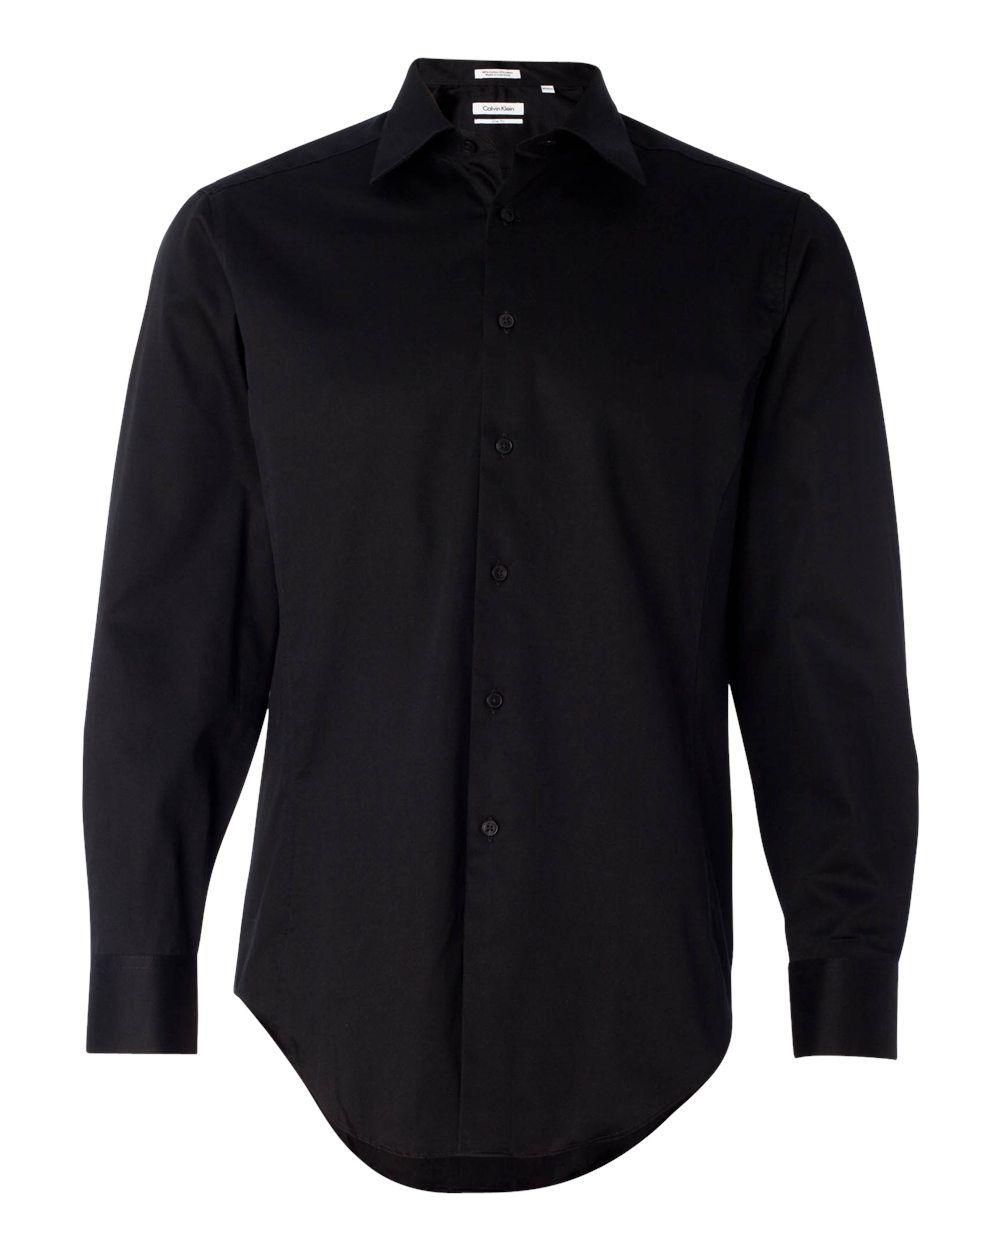 Calvin Klein Slim Fit Cotton Stretch Shirt 13ck023 Black Large Black Dress Shirt Men Mens Shirt Dress Shirts [ 1250 x 1000 Pixel ]